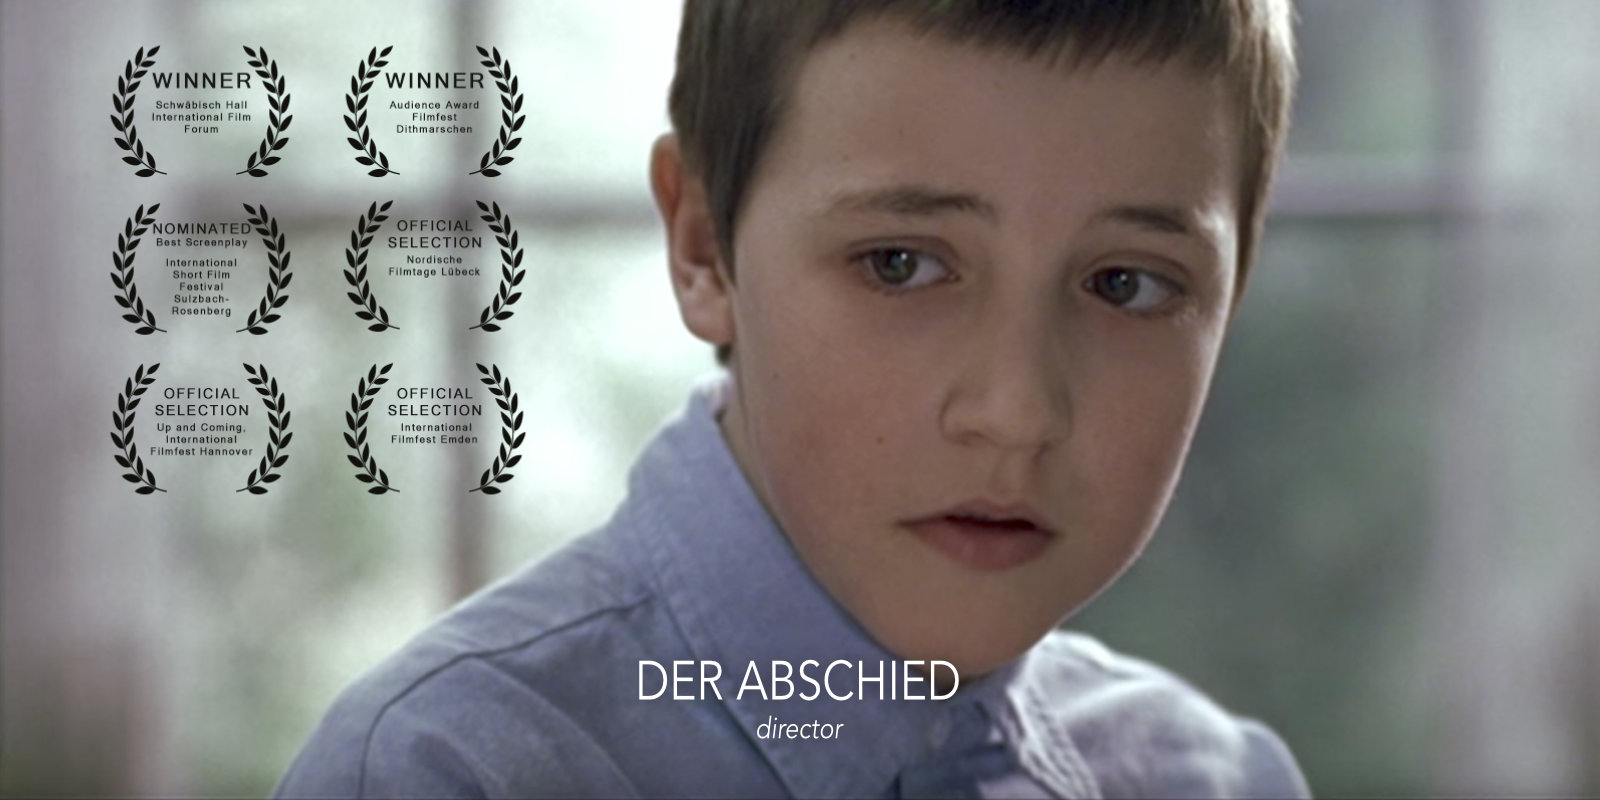 Der Abschied / The Last Goodbye - Regie / Directed by Sören Schulz